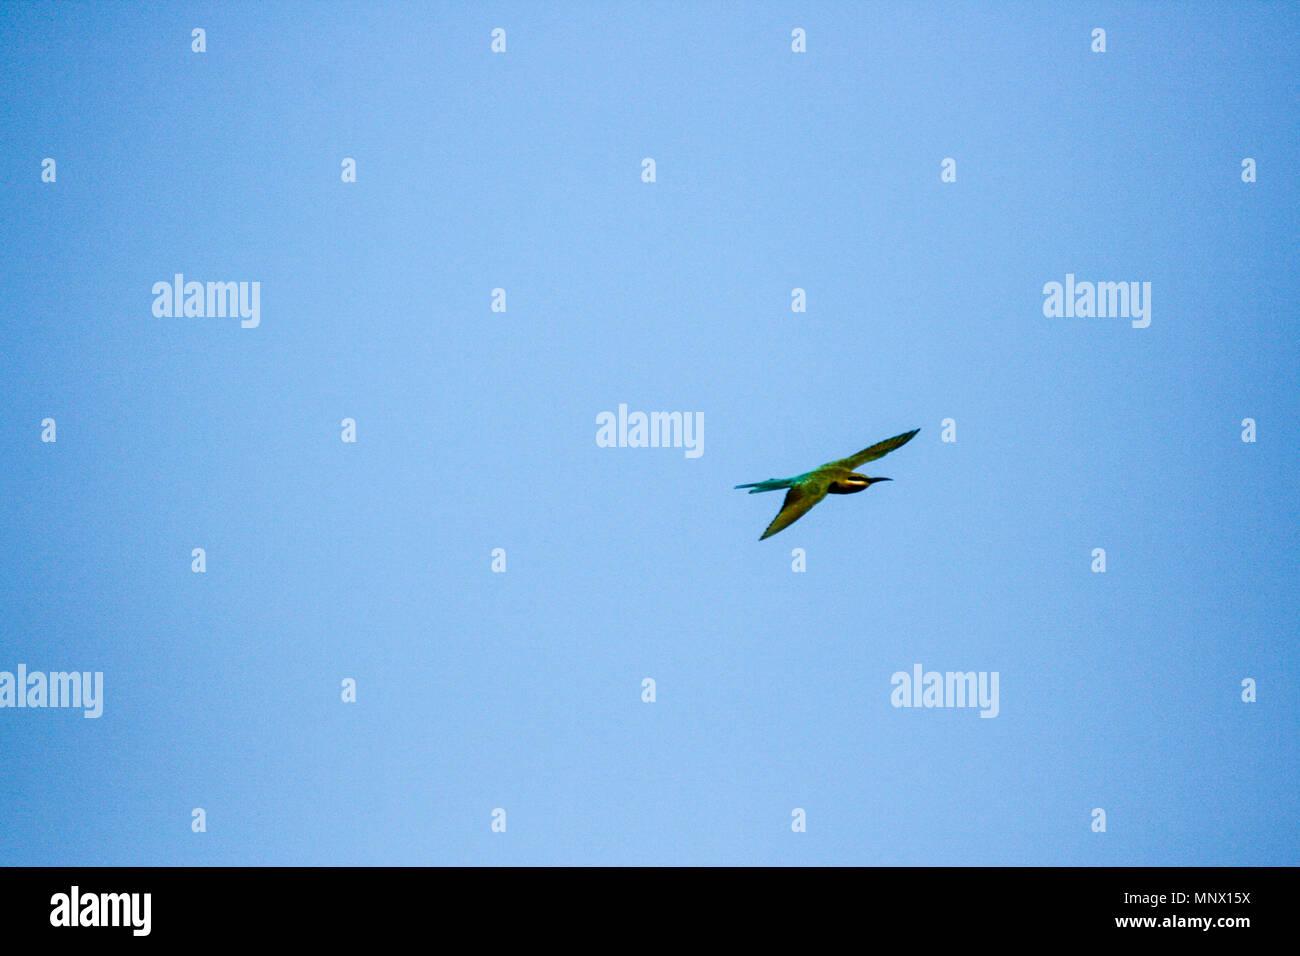 White-throat kingfisher (Halcyon smyrnensis) in Sri Lanka - Stock Image